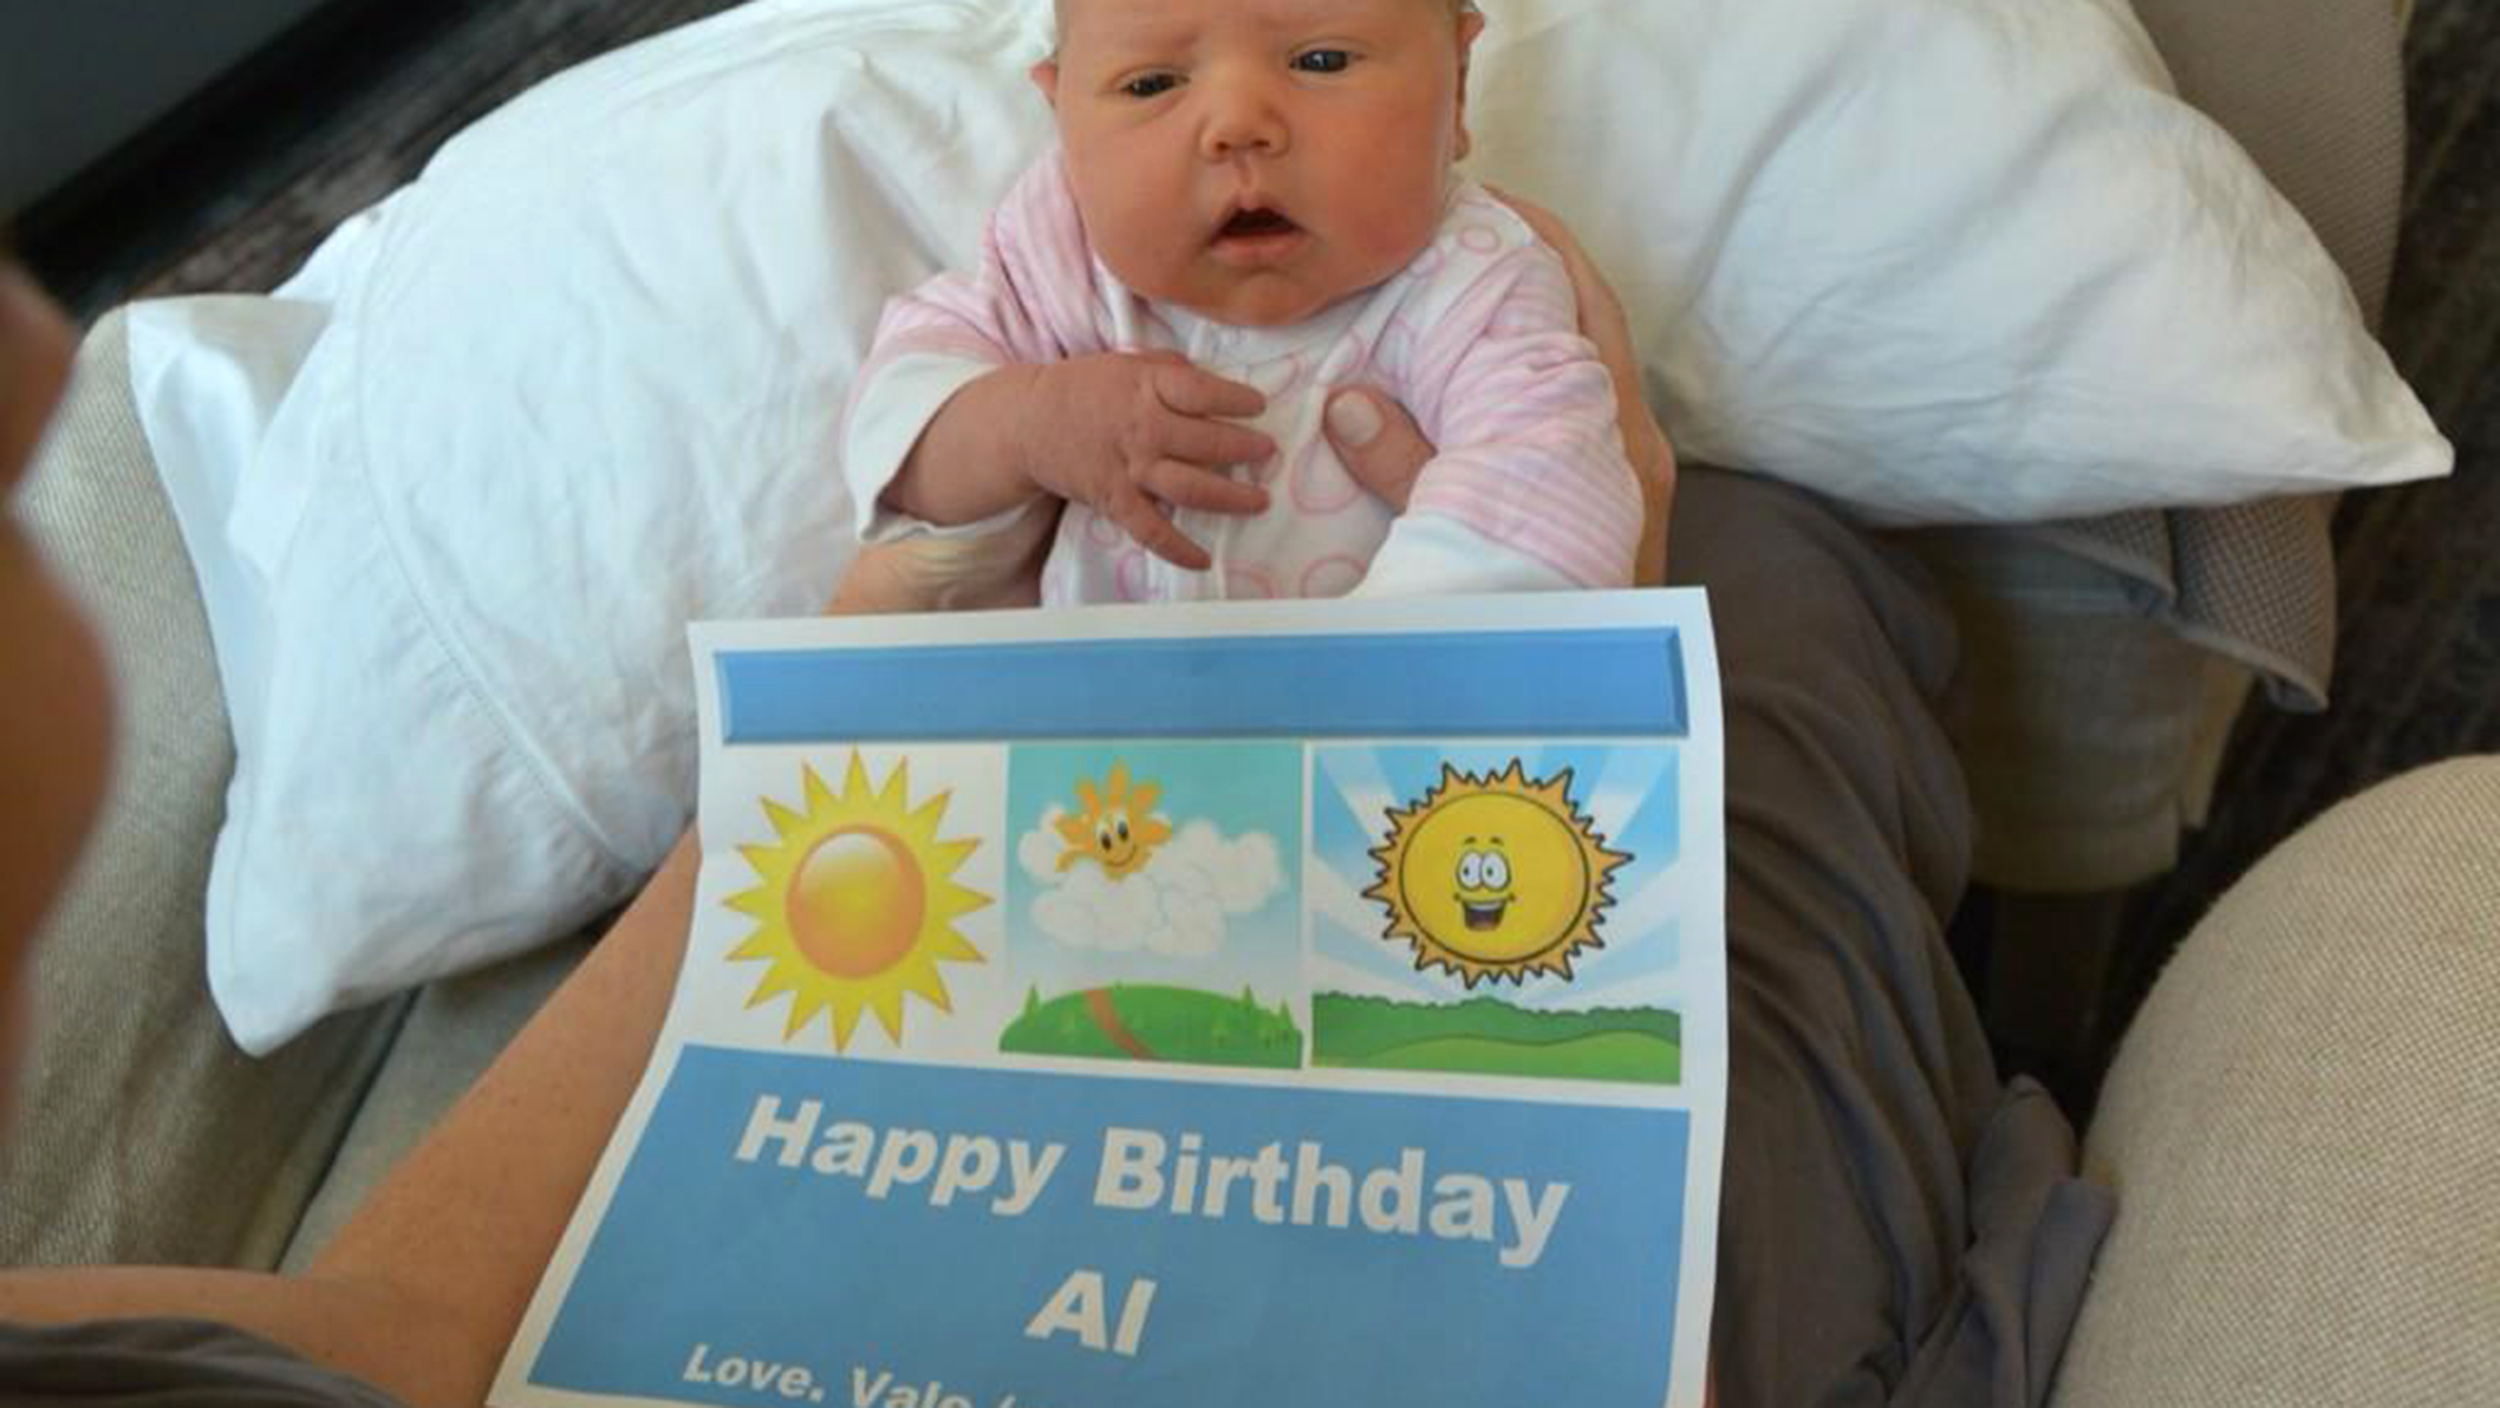 Savannah Guthrie Baby Vale Wish Al Roker A Happy 60th